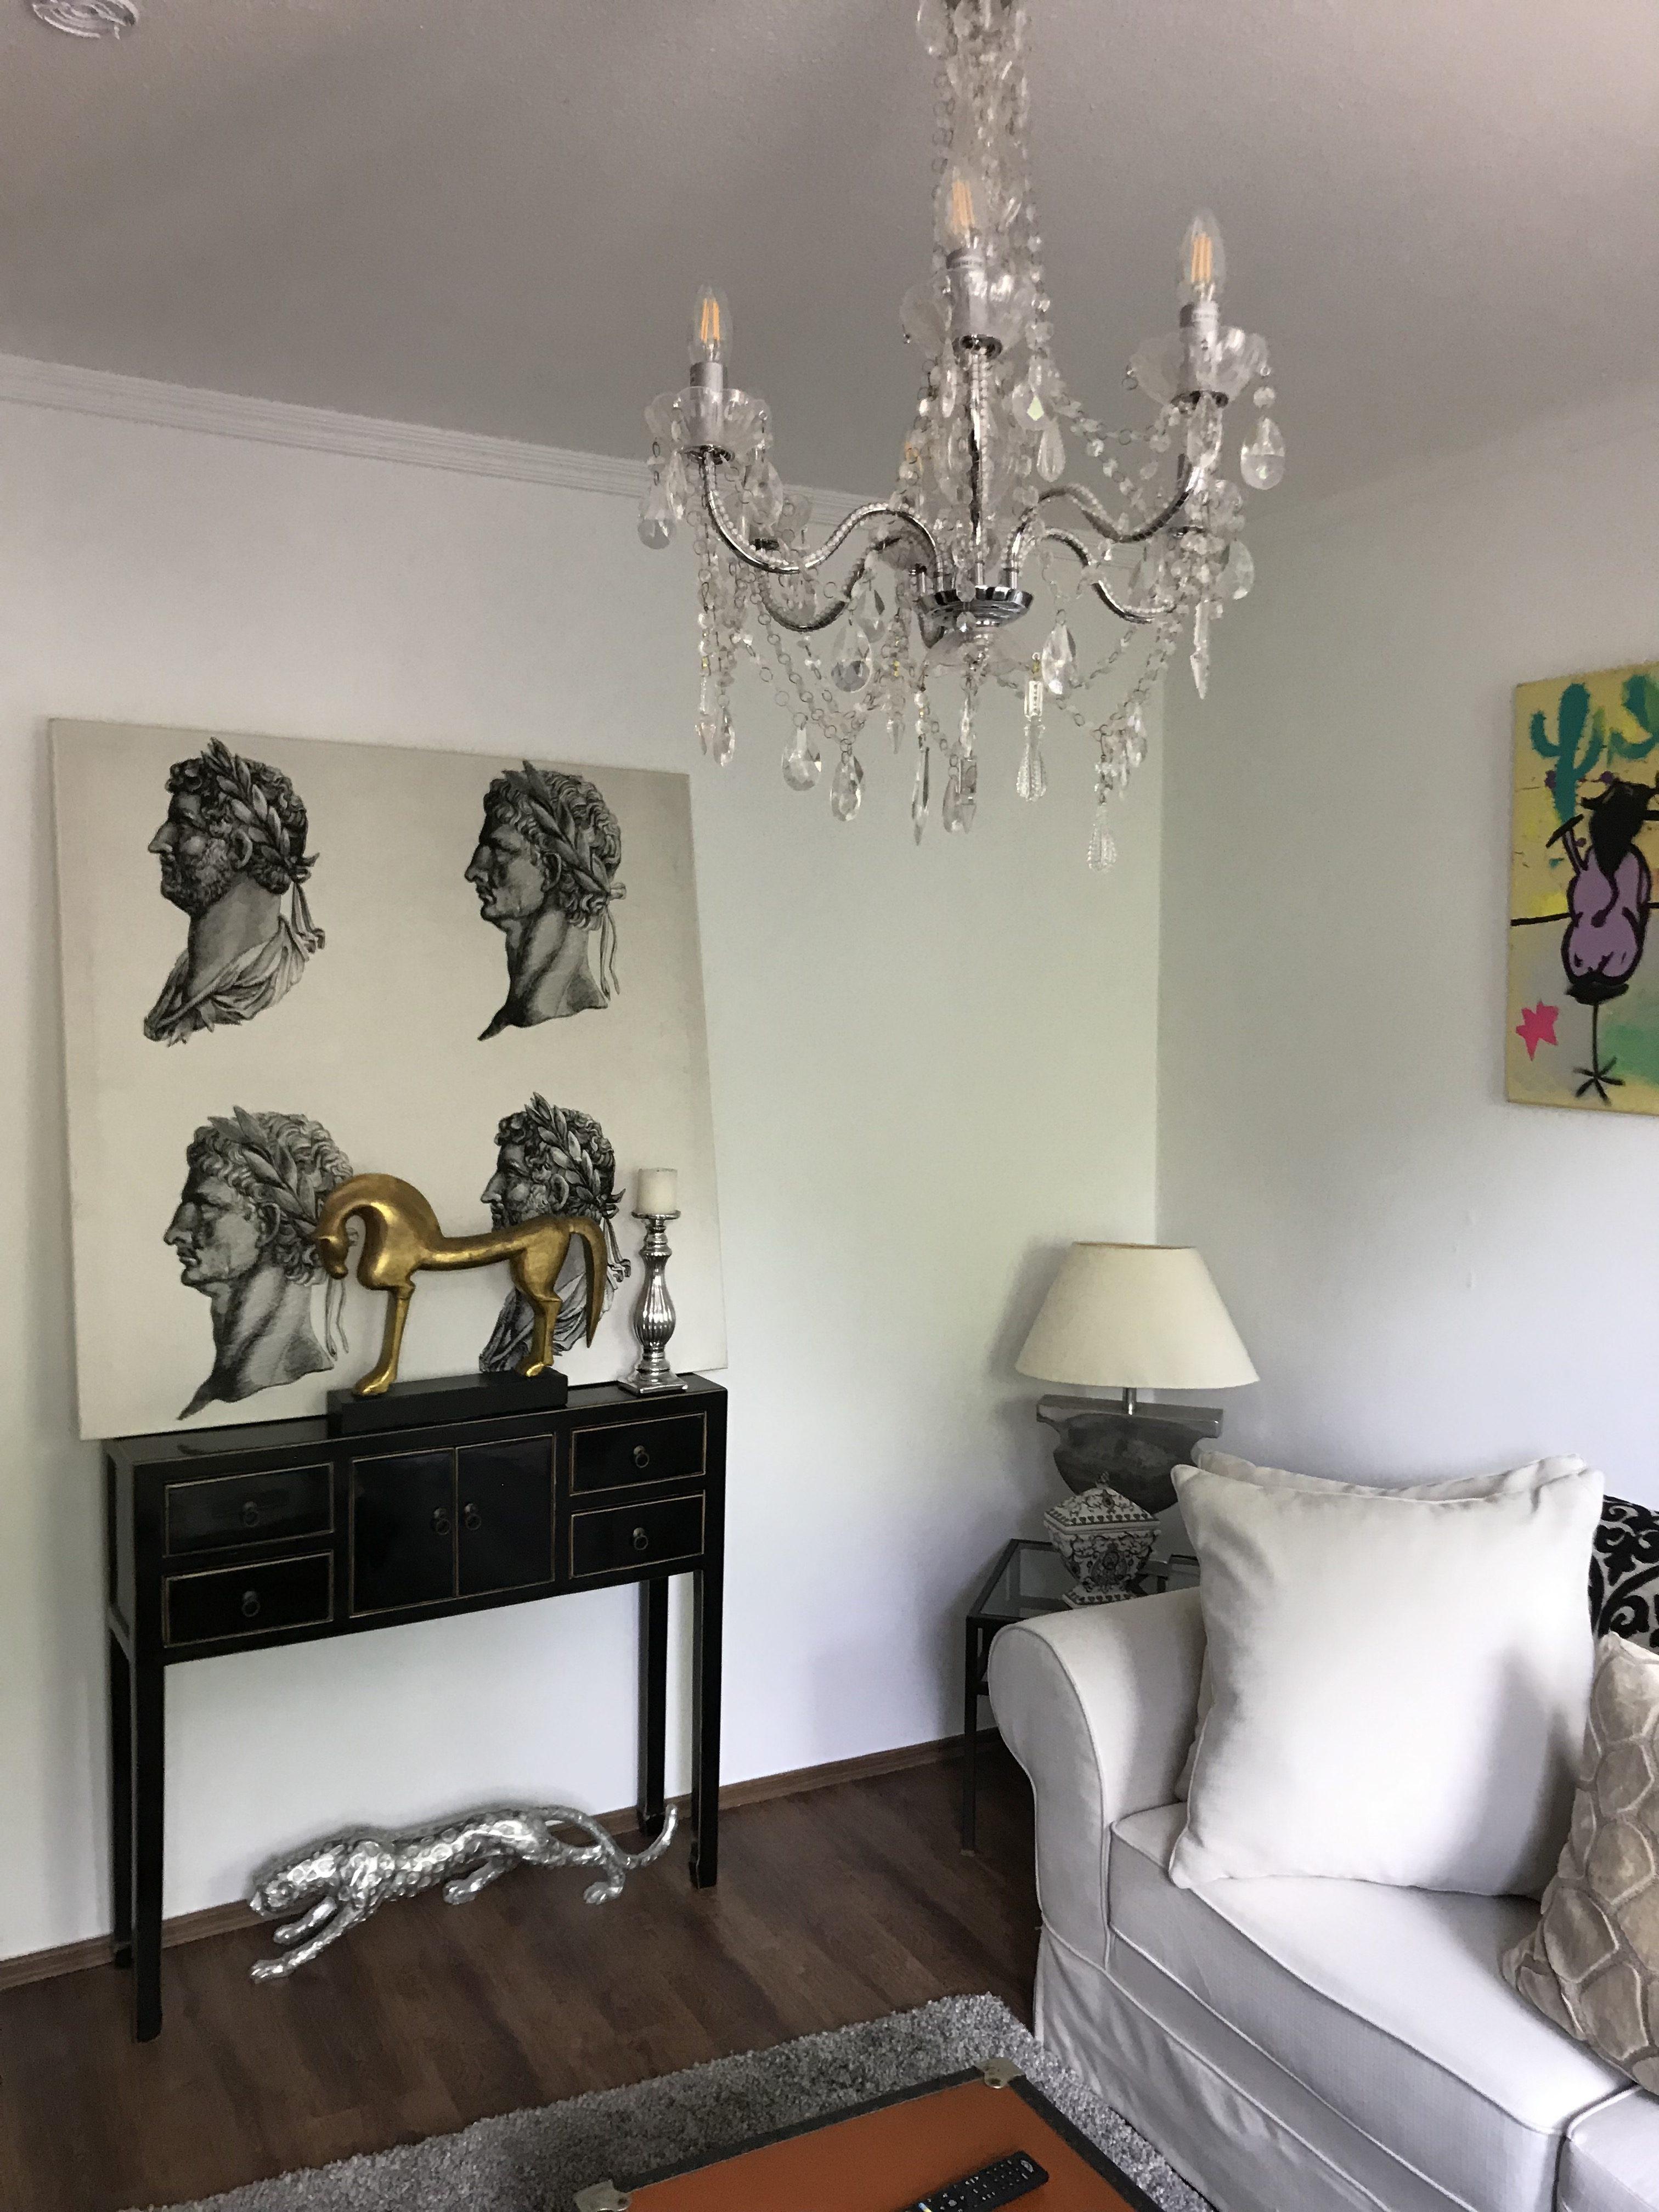 City Wohnung Gütersloh - OWL Intim Erotik